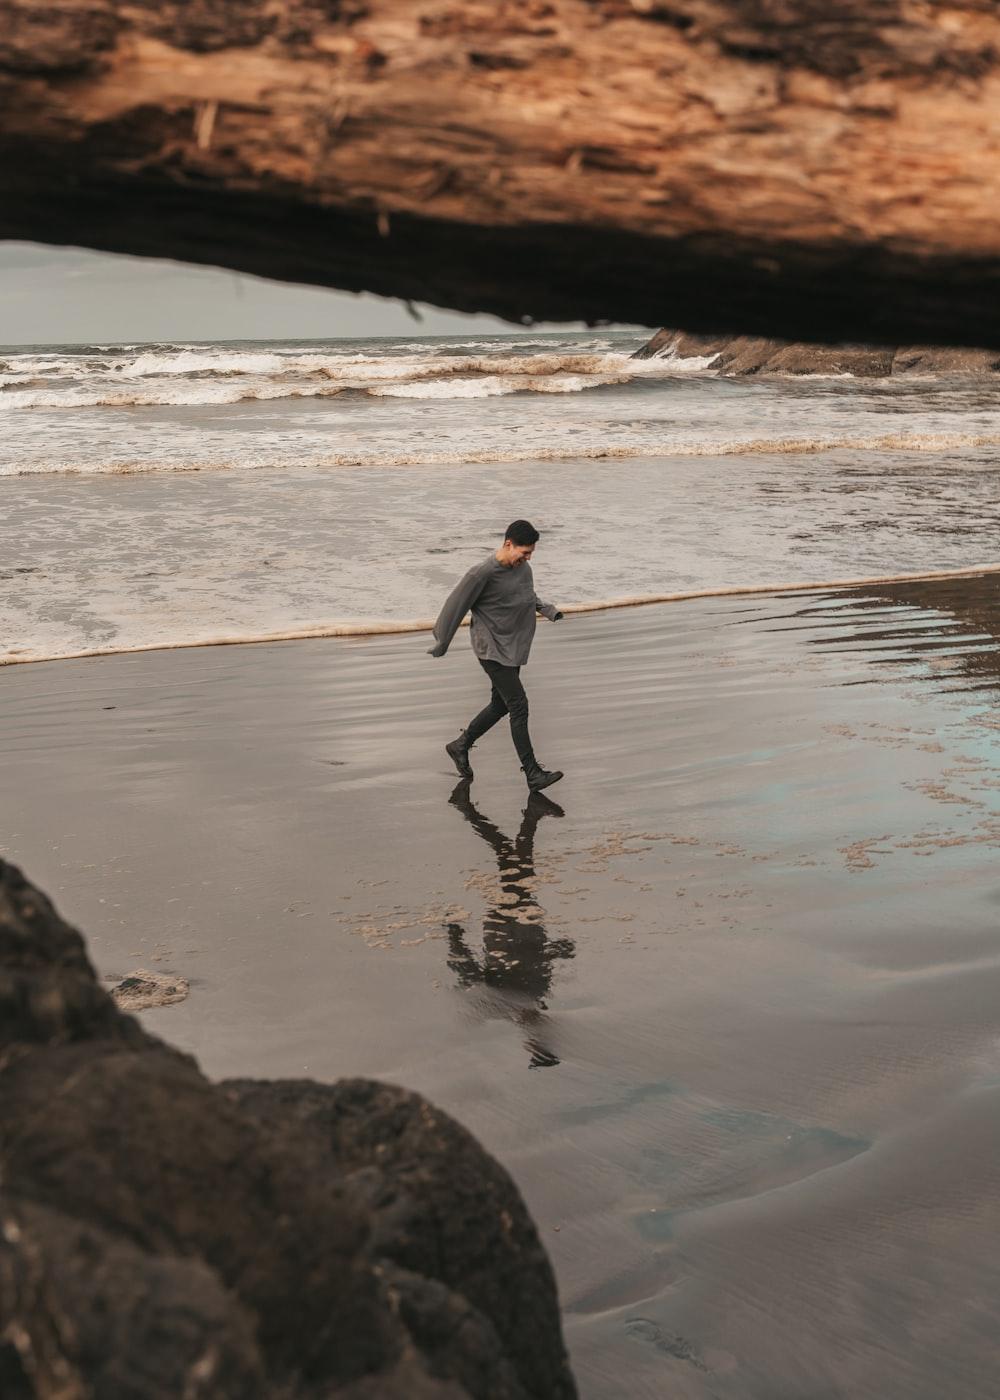 man in gray jacket and black pants walking on seashore during daytime